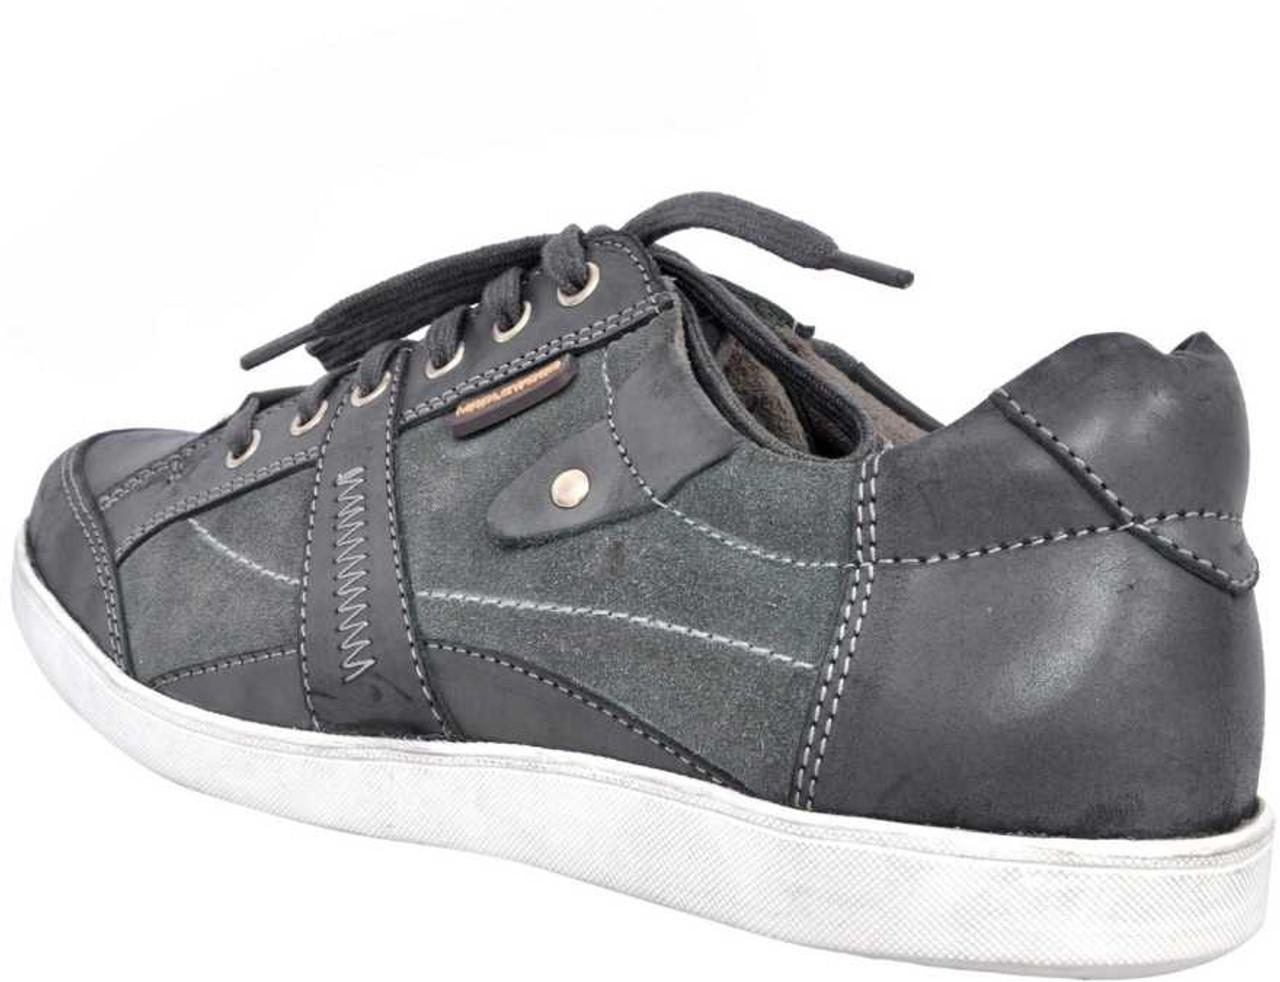 Maplewood Bronx Shoes Grey